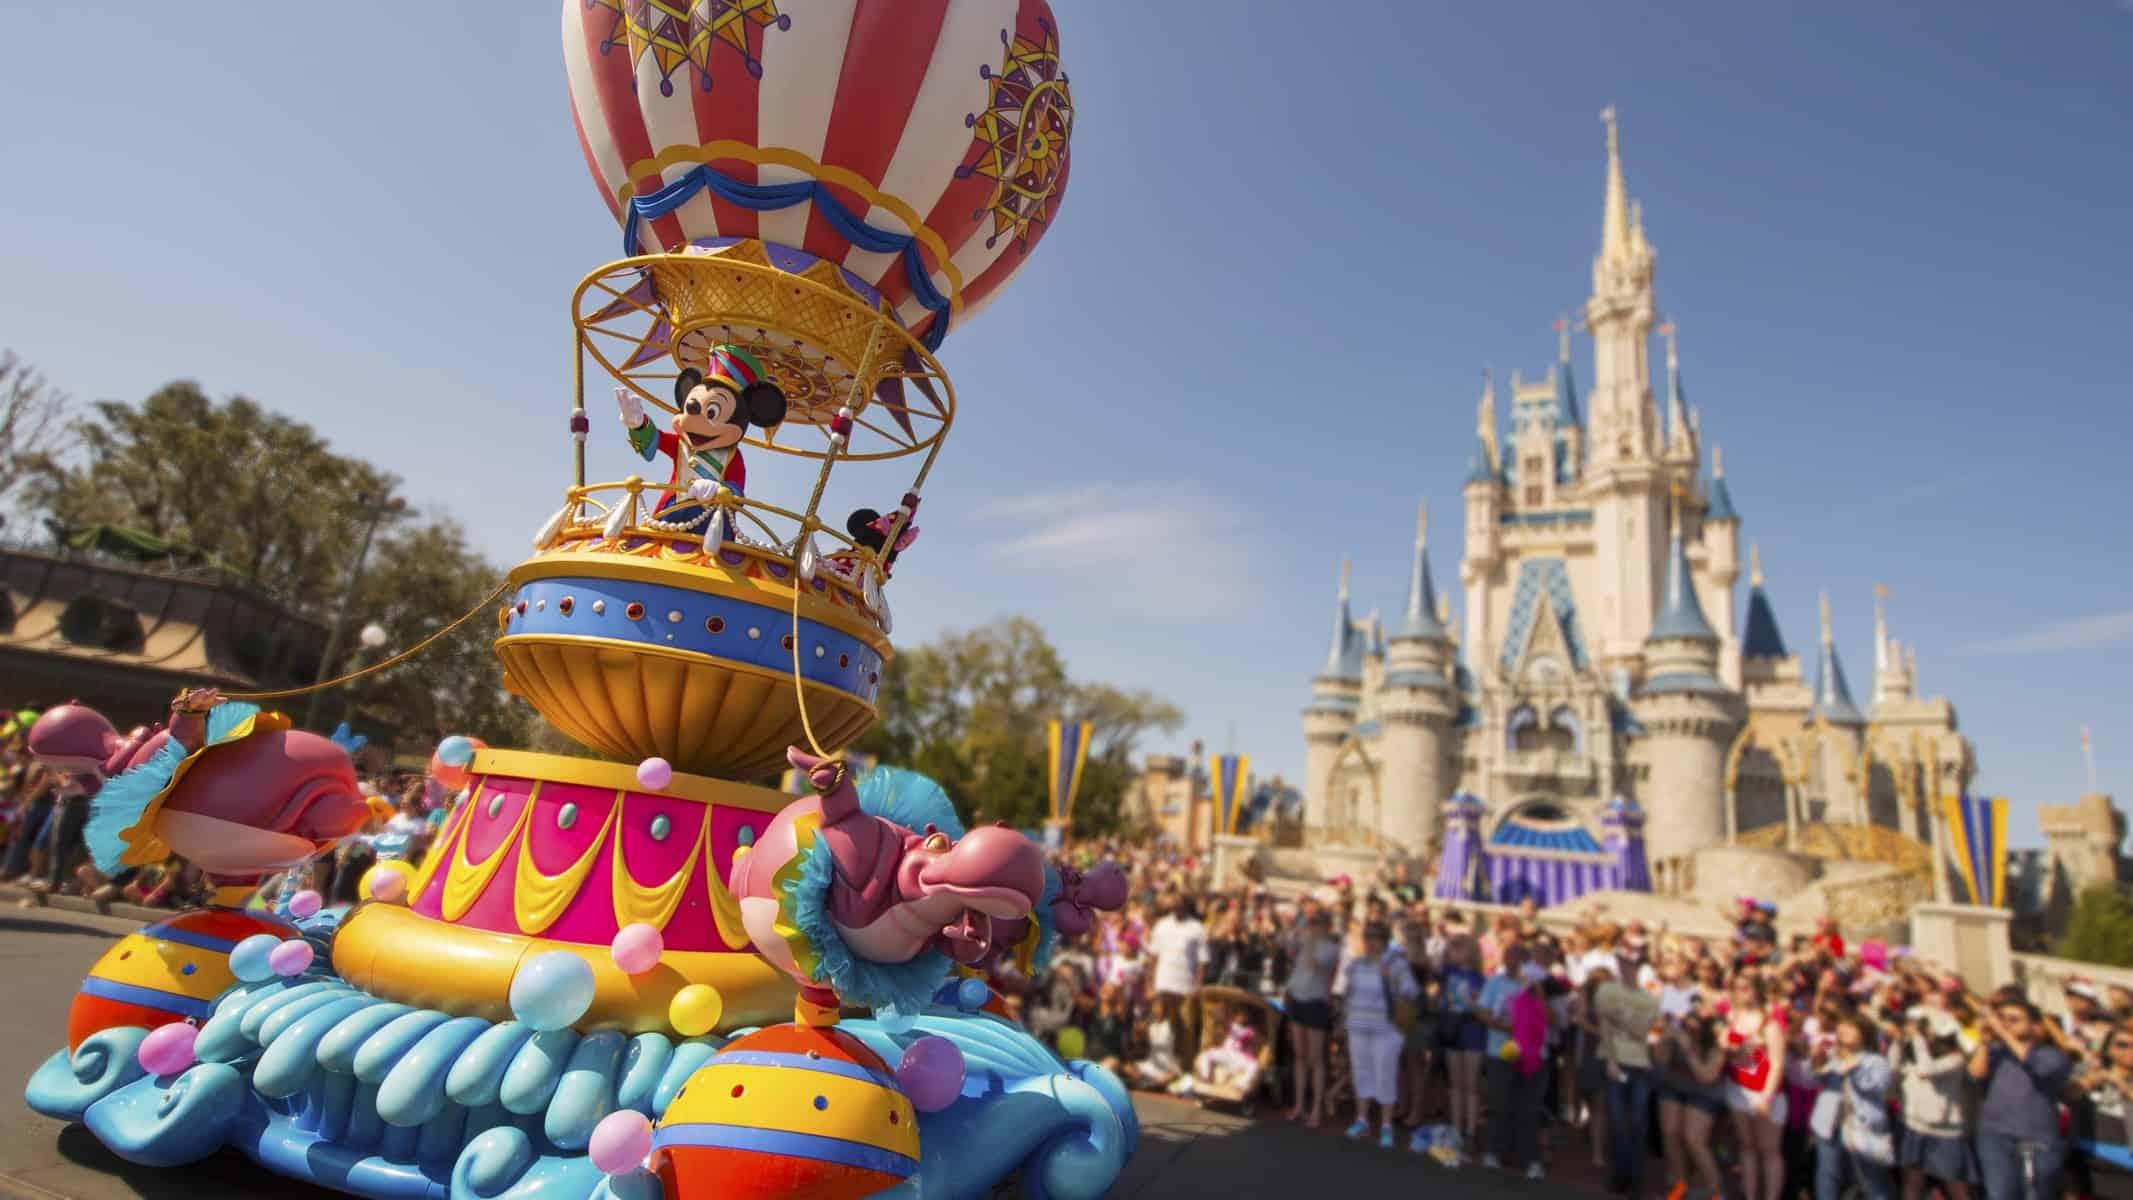 Festival of Fantasy Parade – Temporarily Unavailable